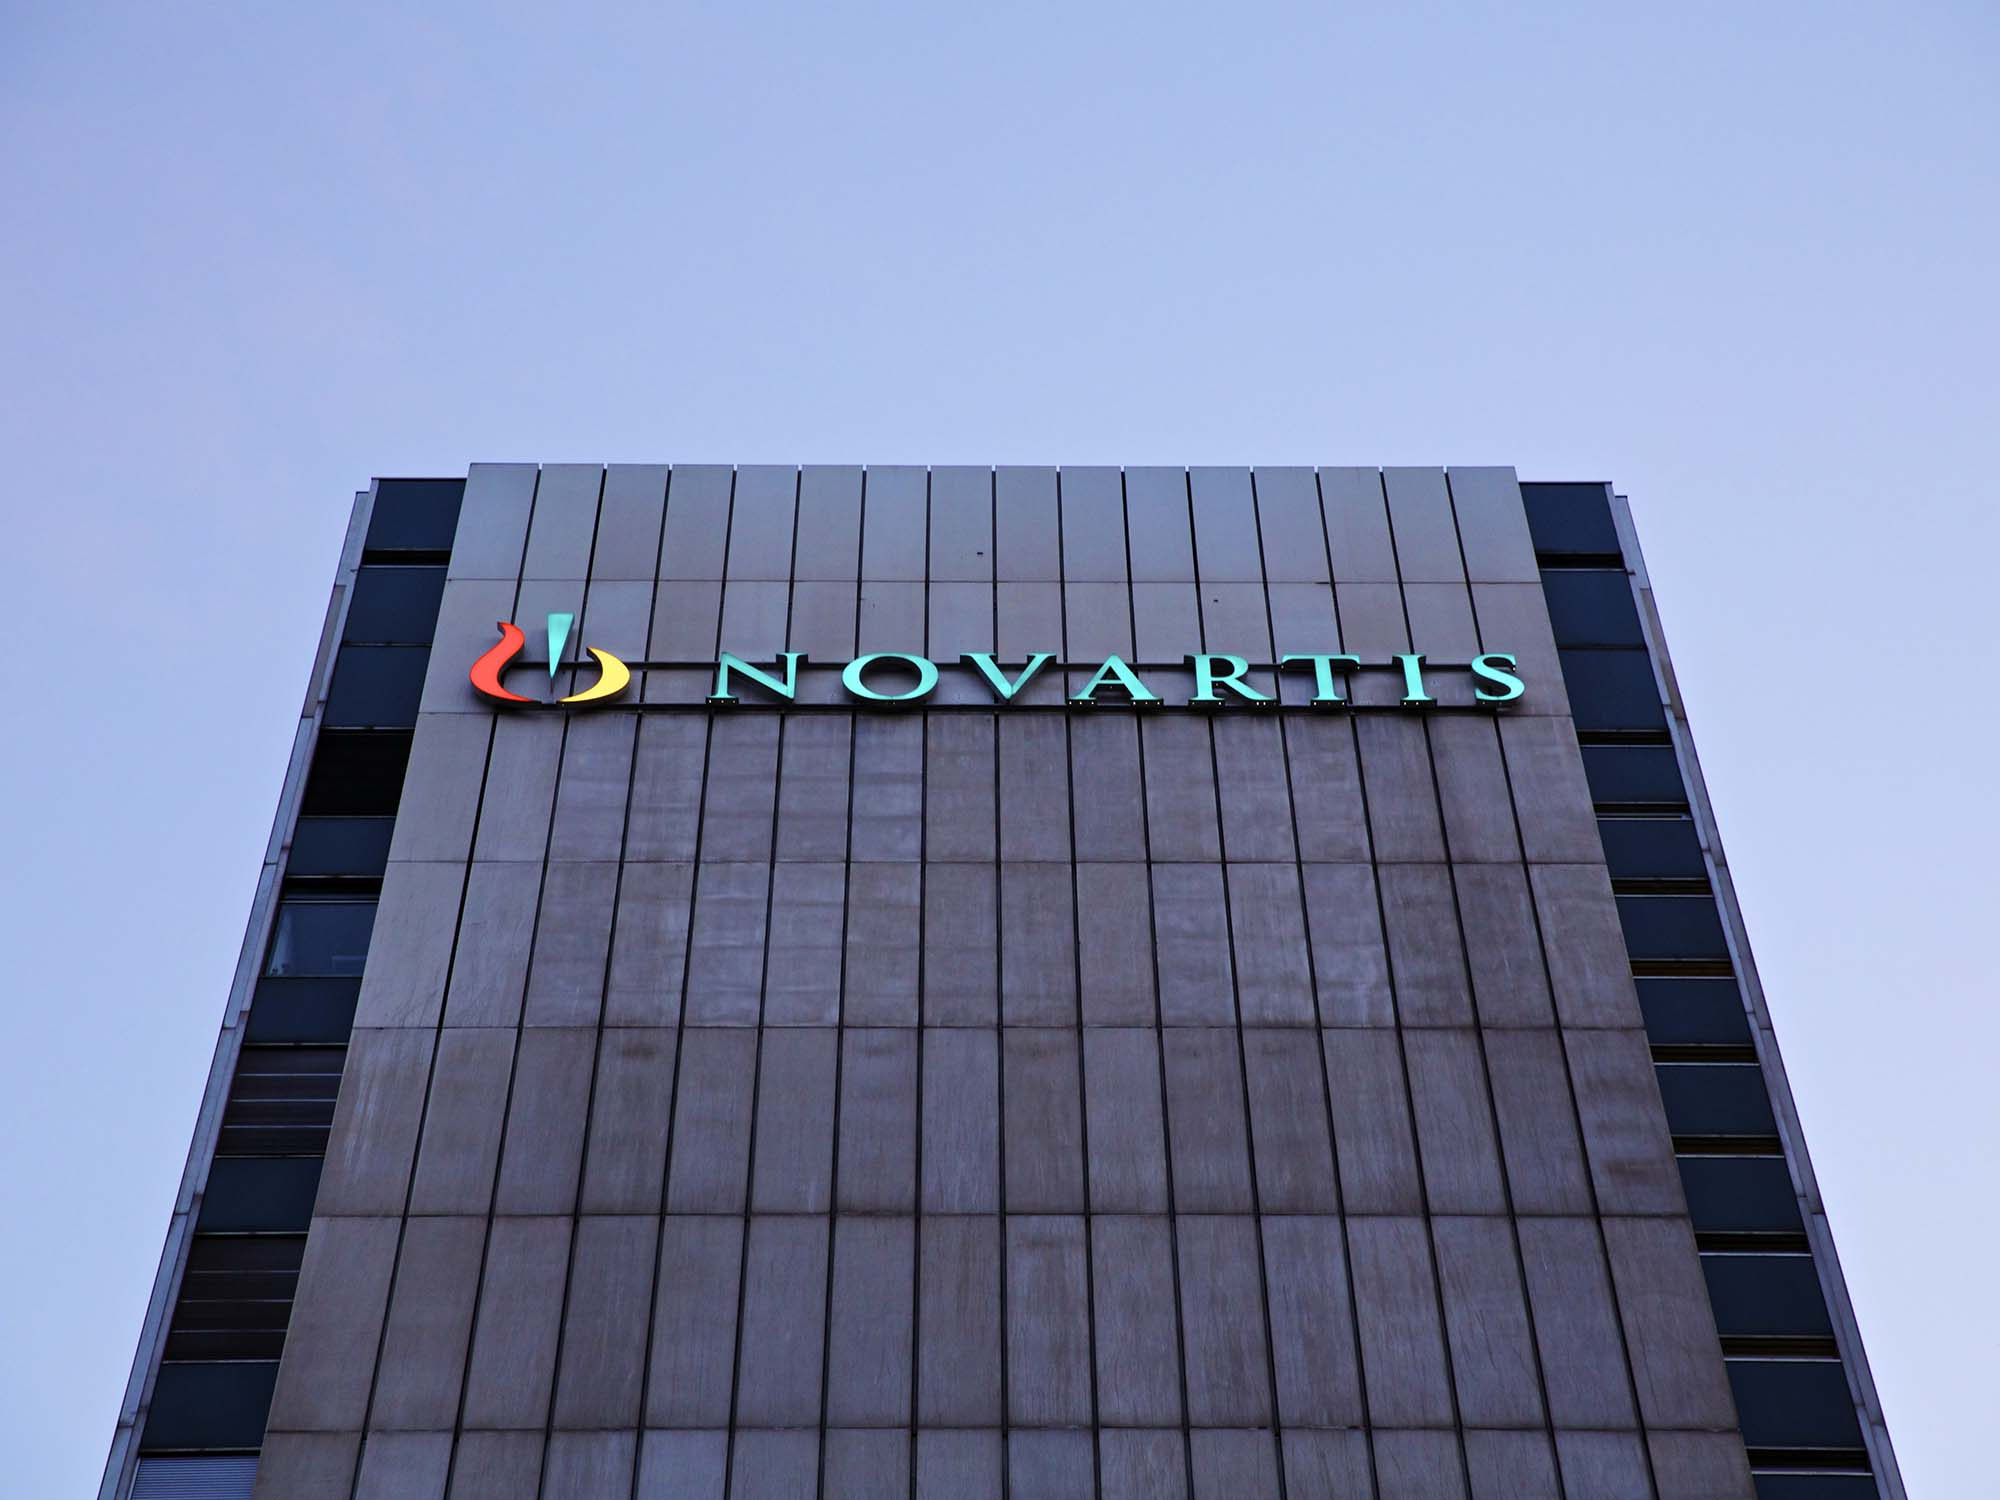 bloomberg.com - James Paton - Novartis Follows Pfizer in Holding Line on U.S. Prices